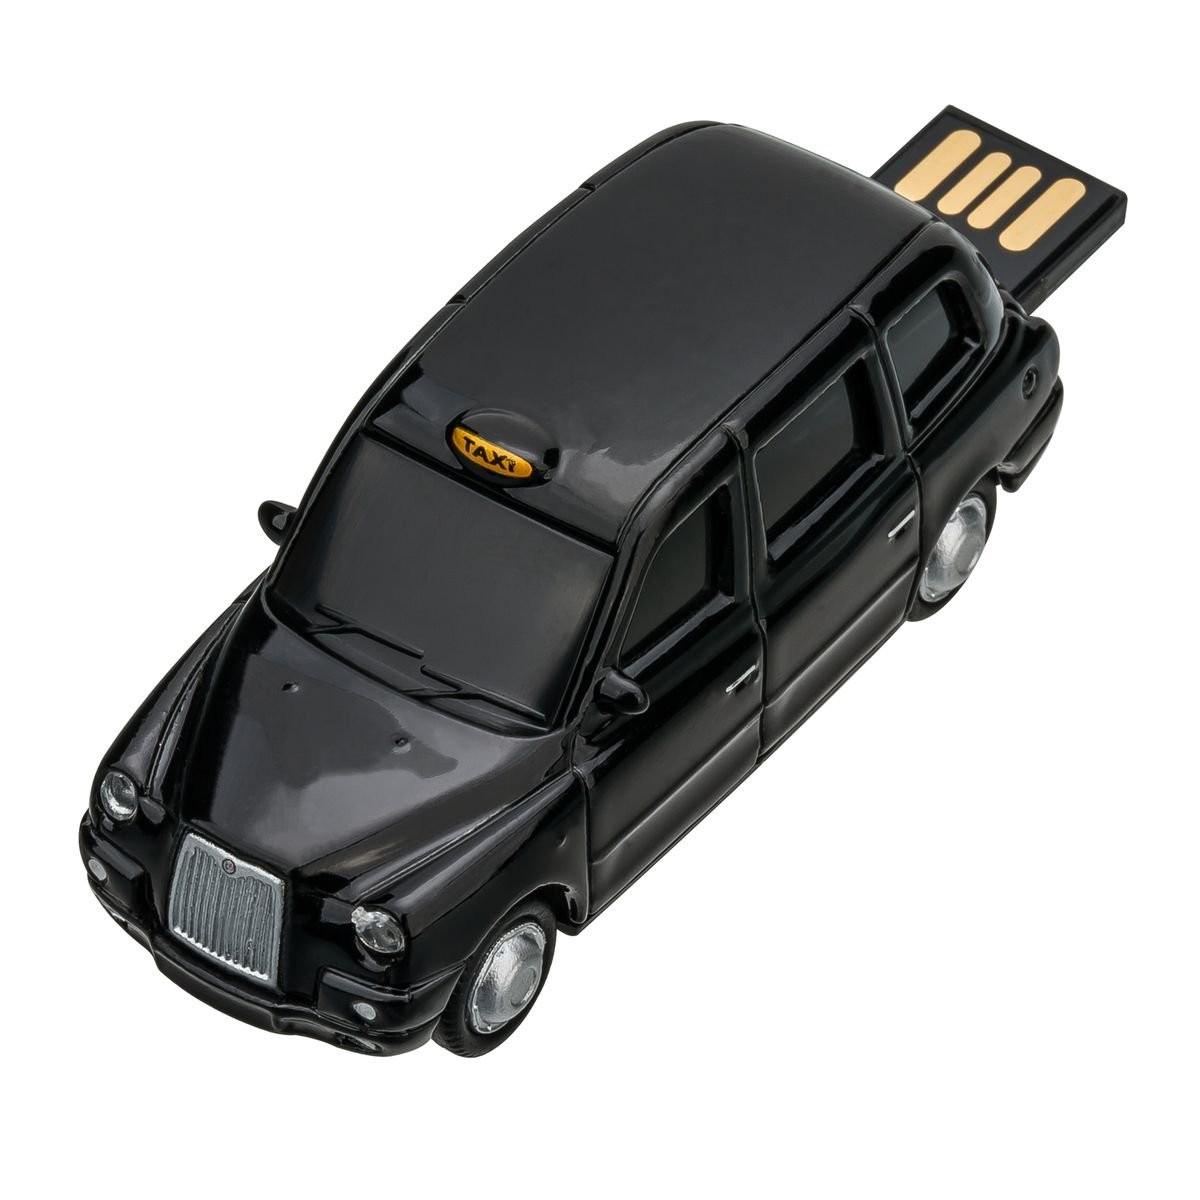 USB flash drive London Taxi TX4 1:72 BLACK 16GB, View 10